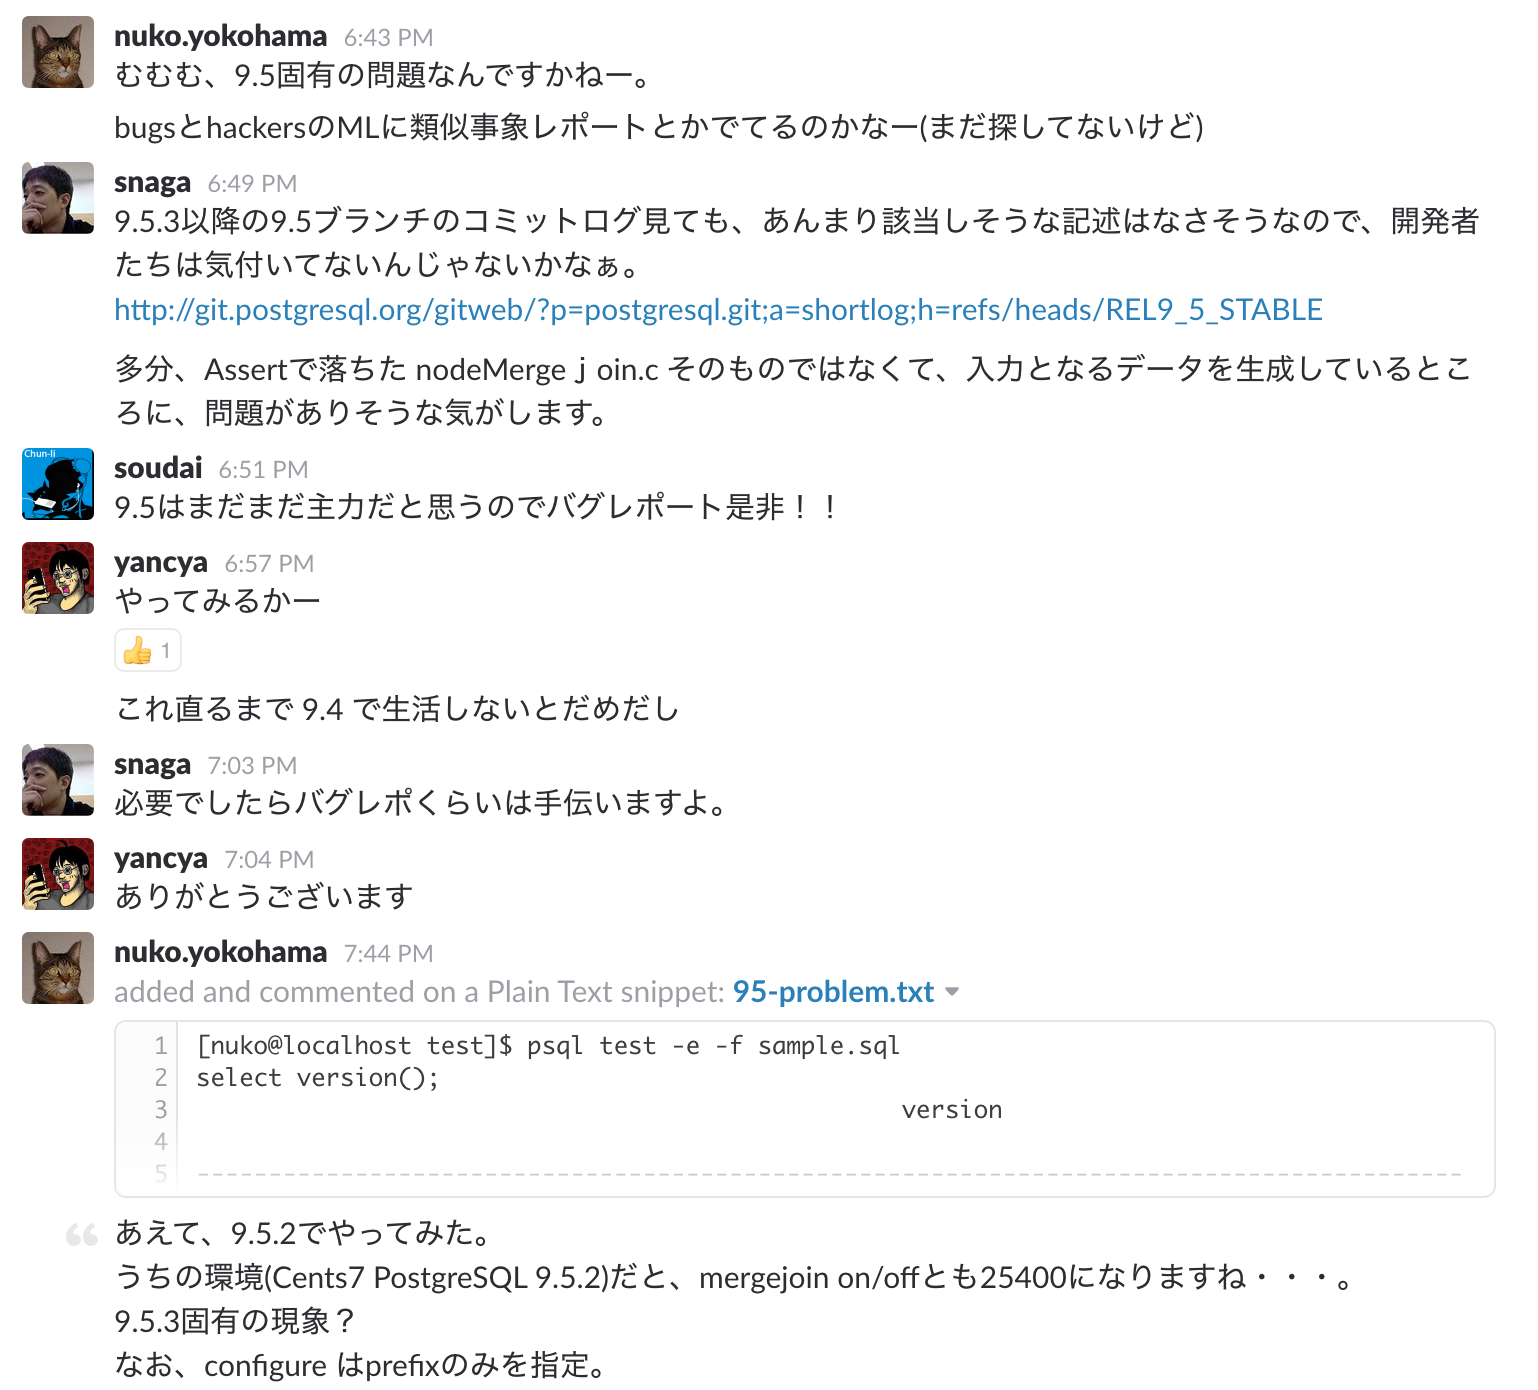 Slack_-_postgresql-jp 4.png